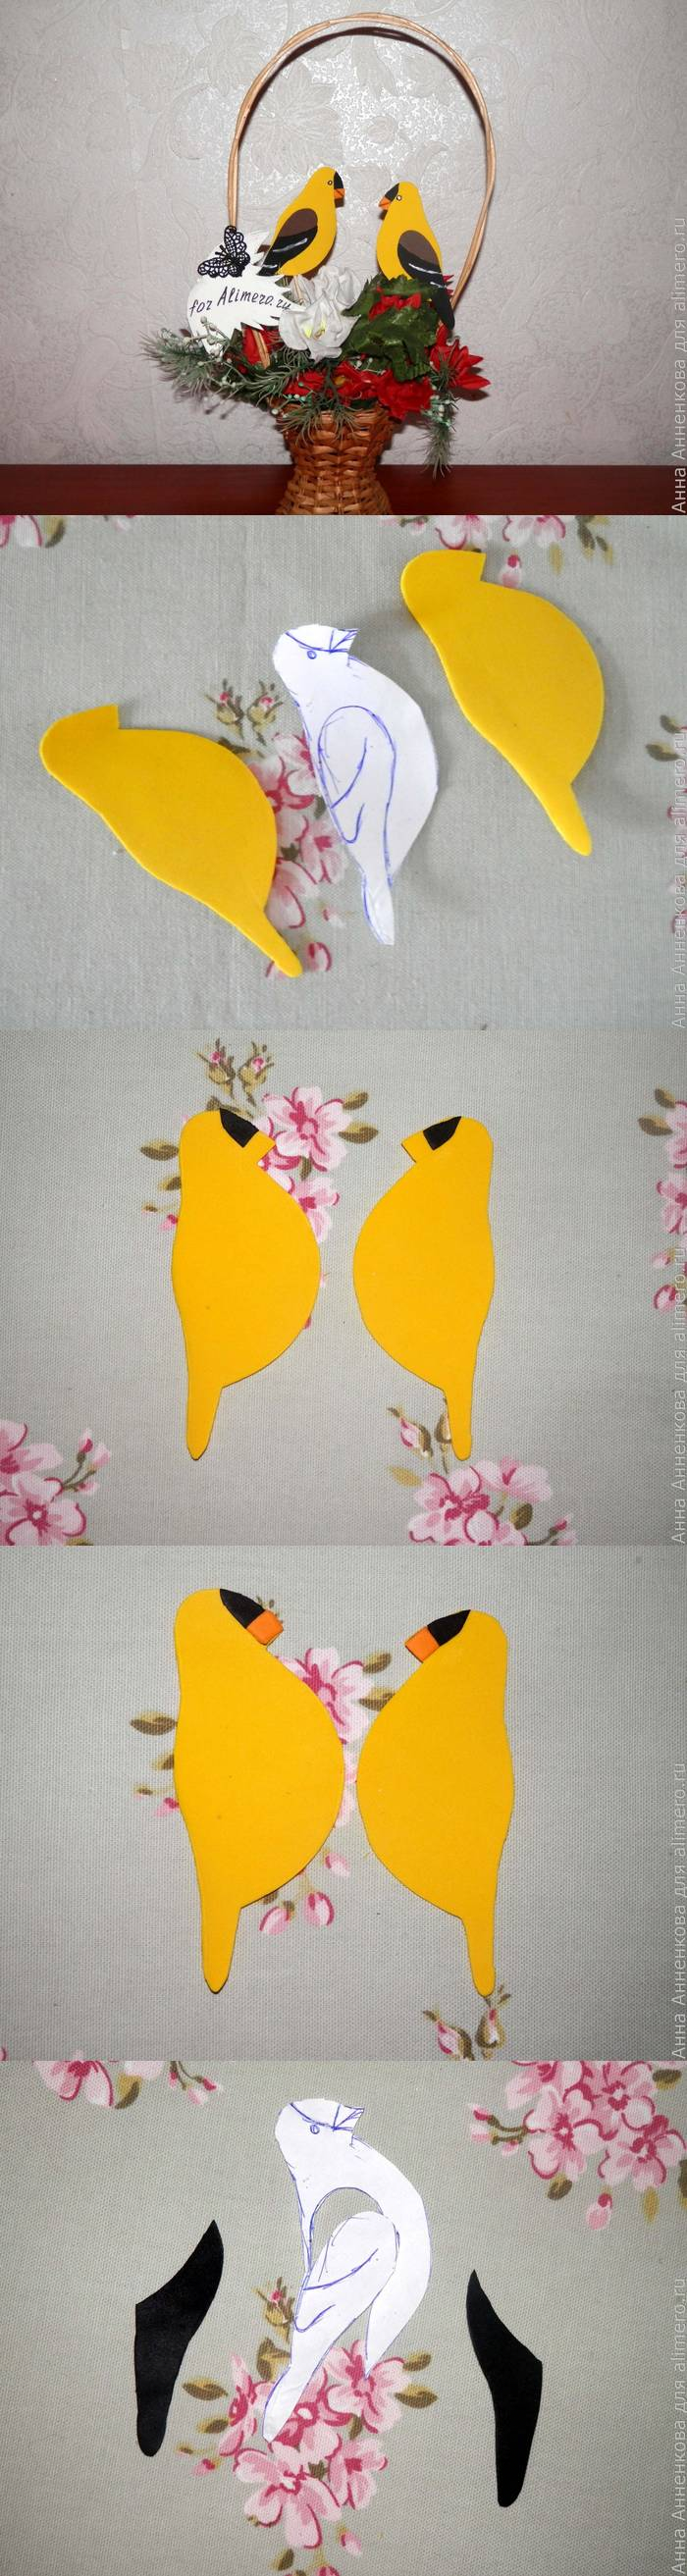 Поделки из фоамирана — птички